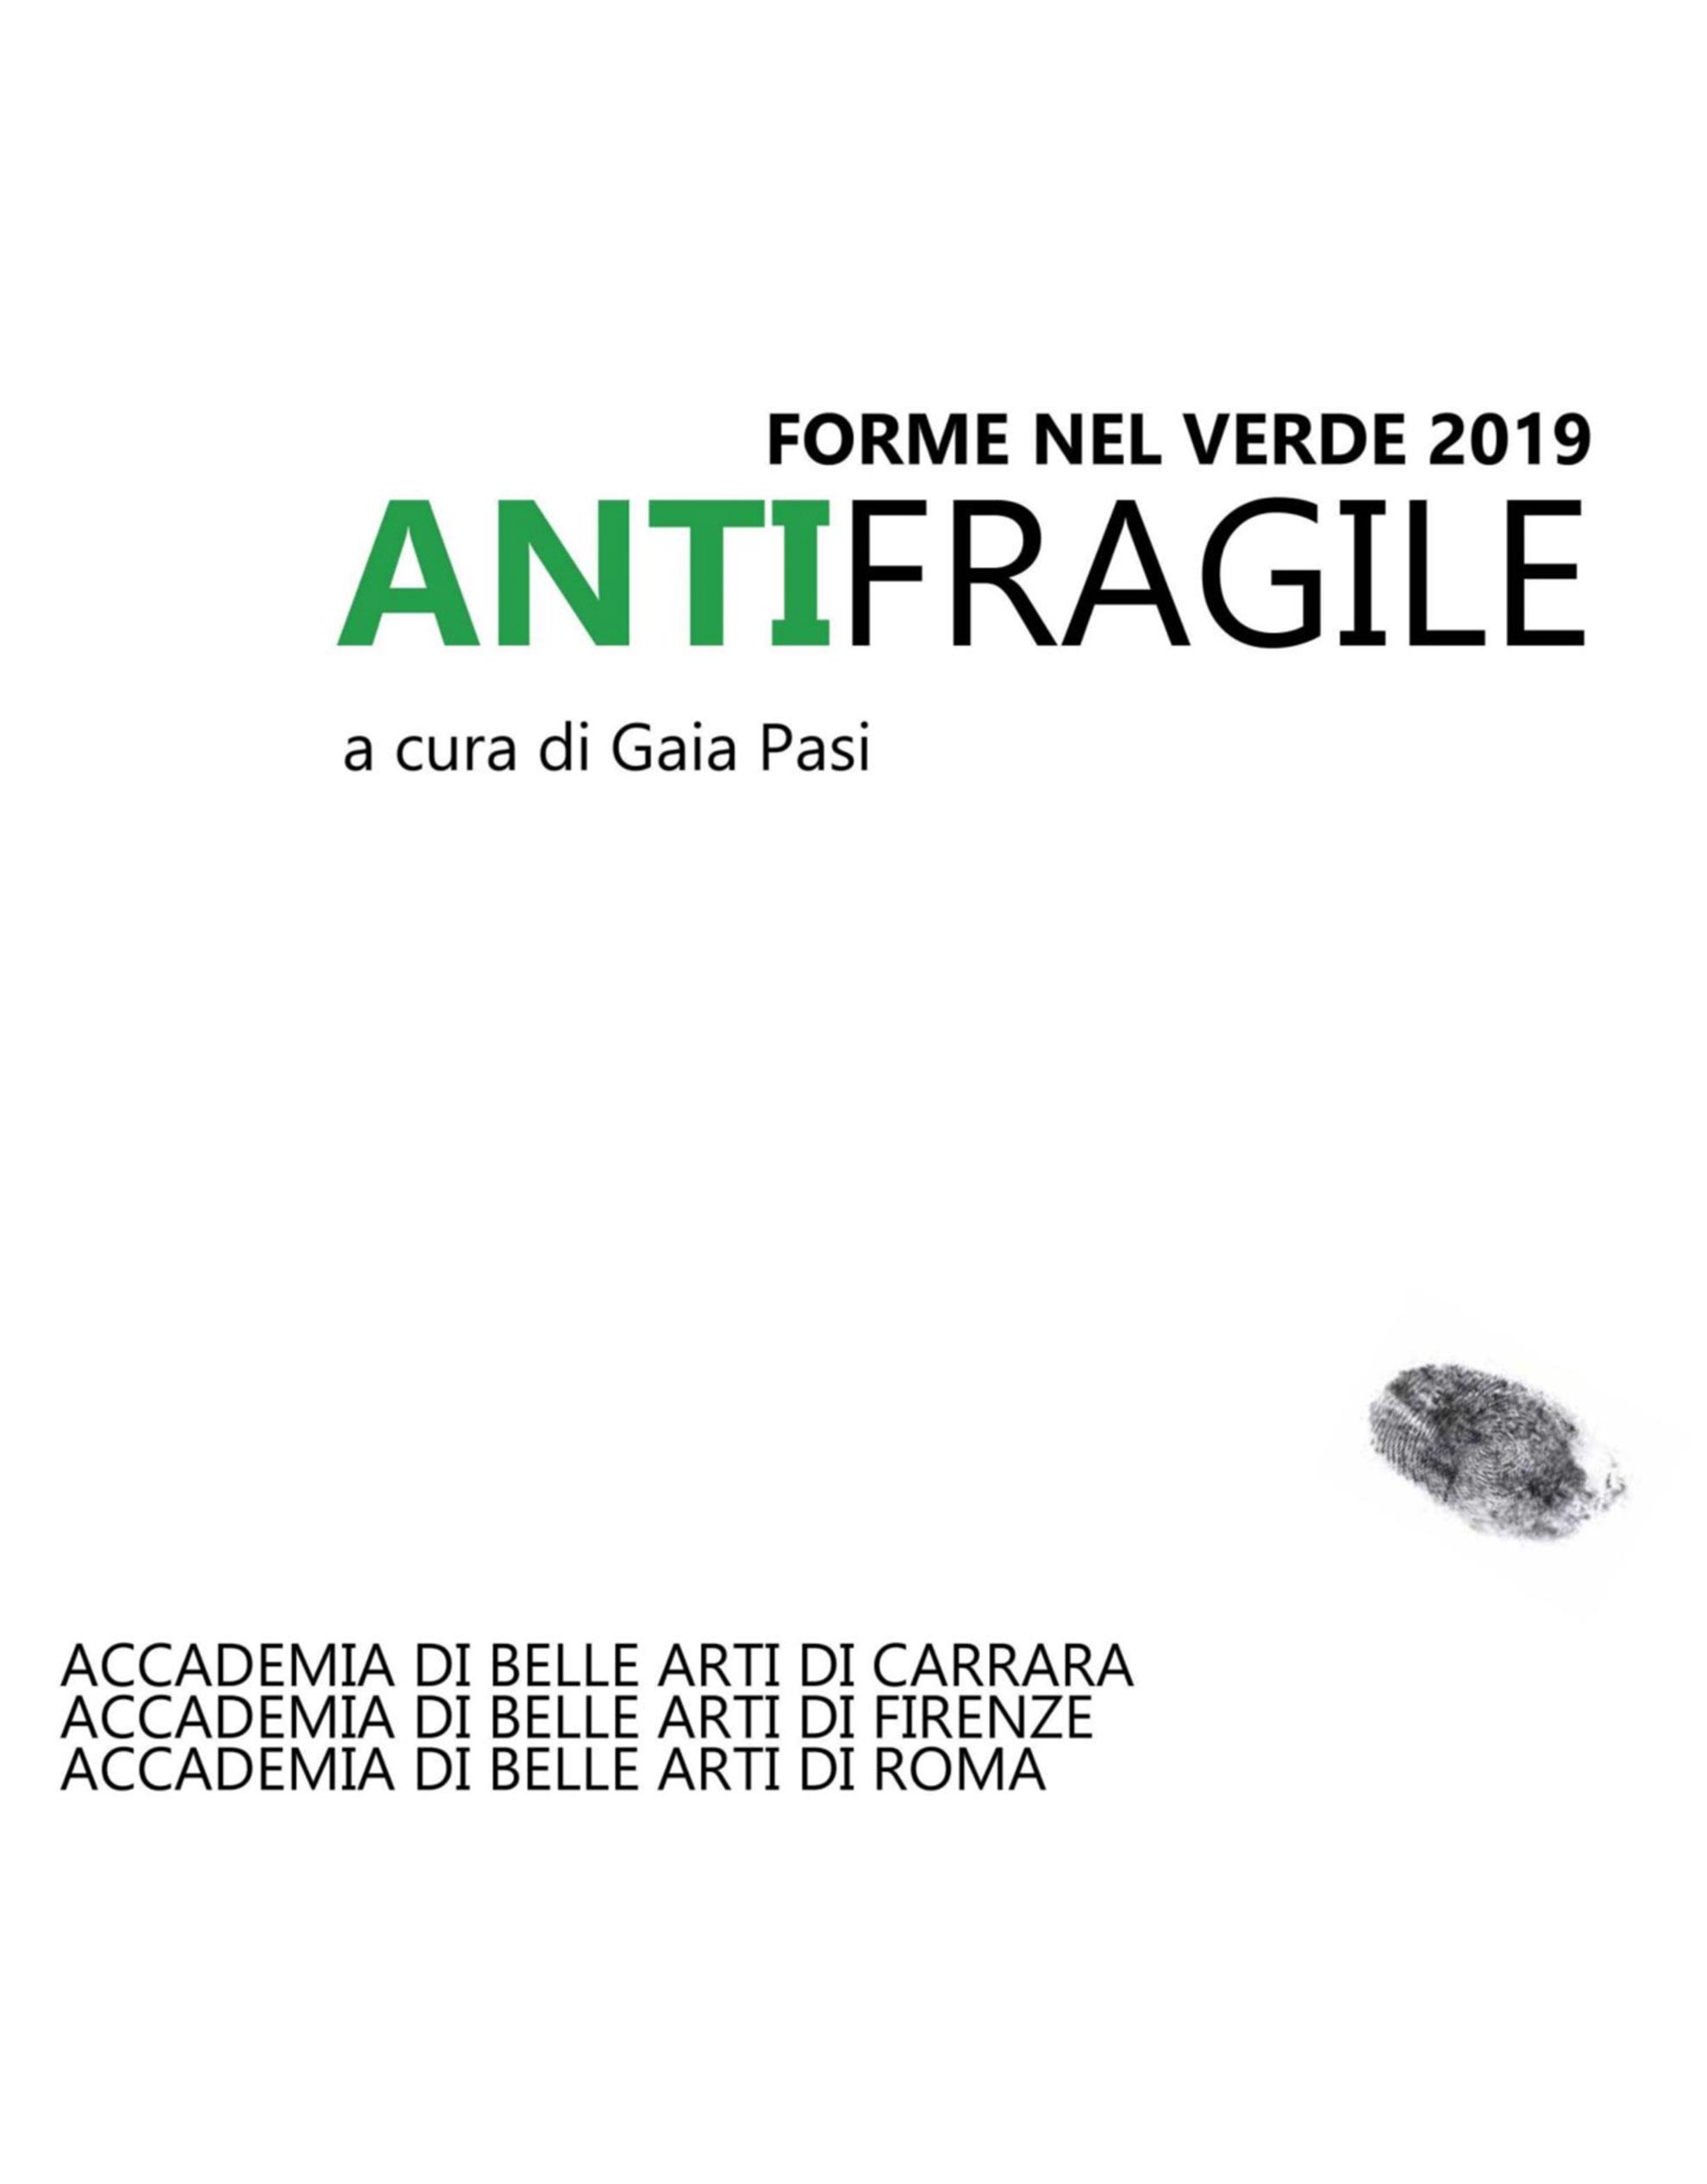 Catalogo Forme nel Verde 2019